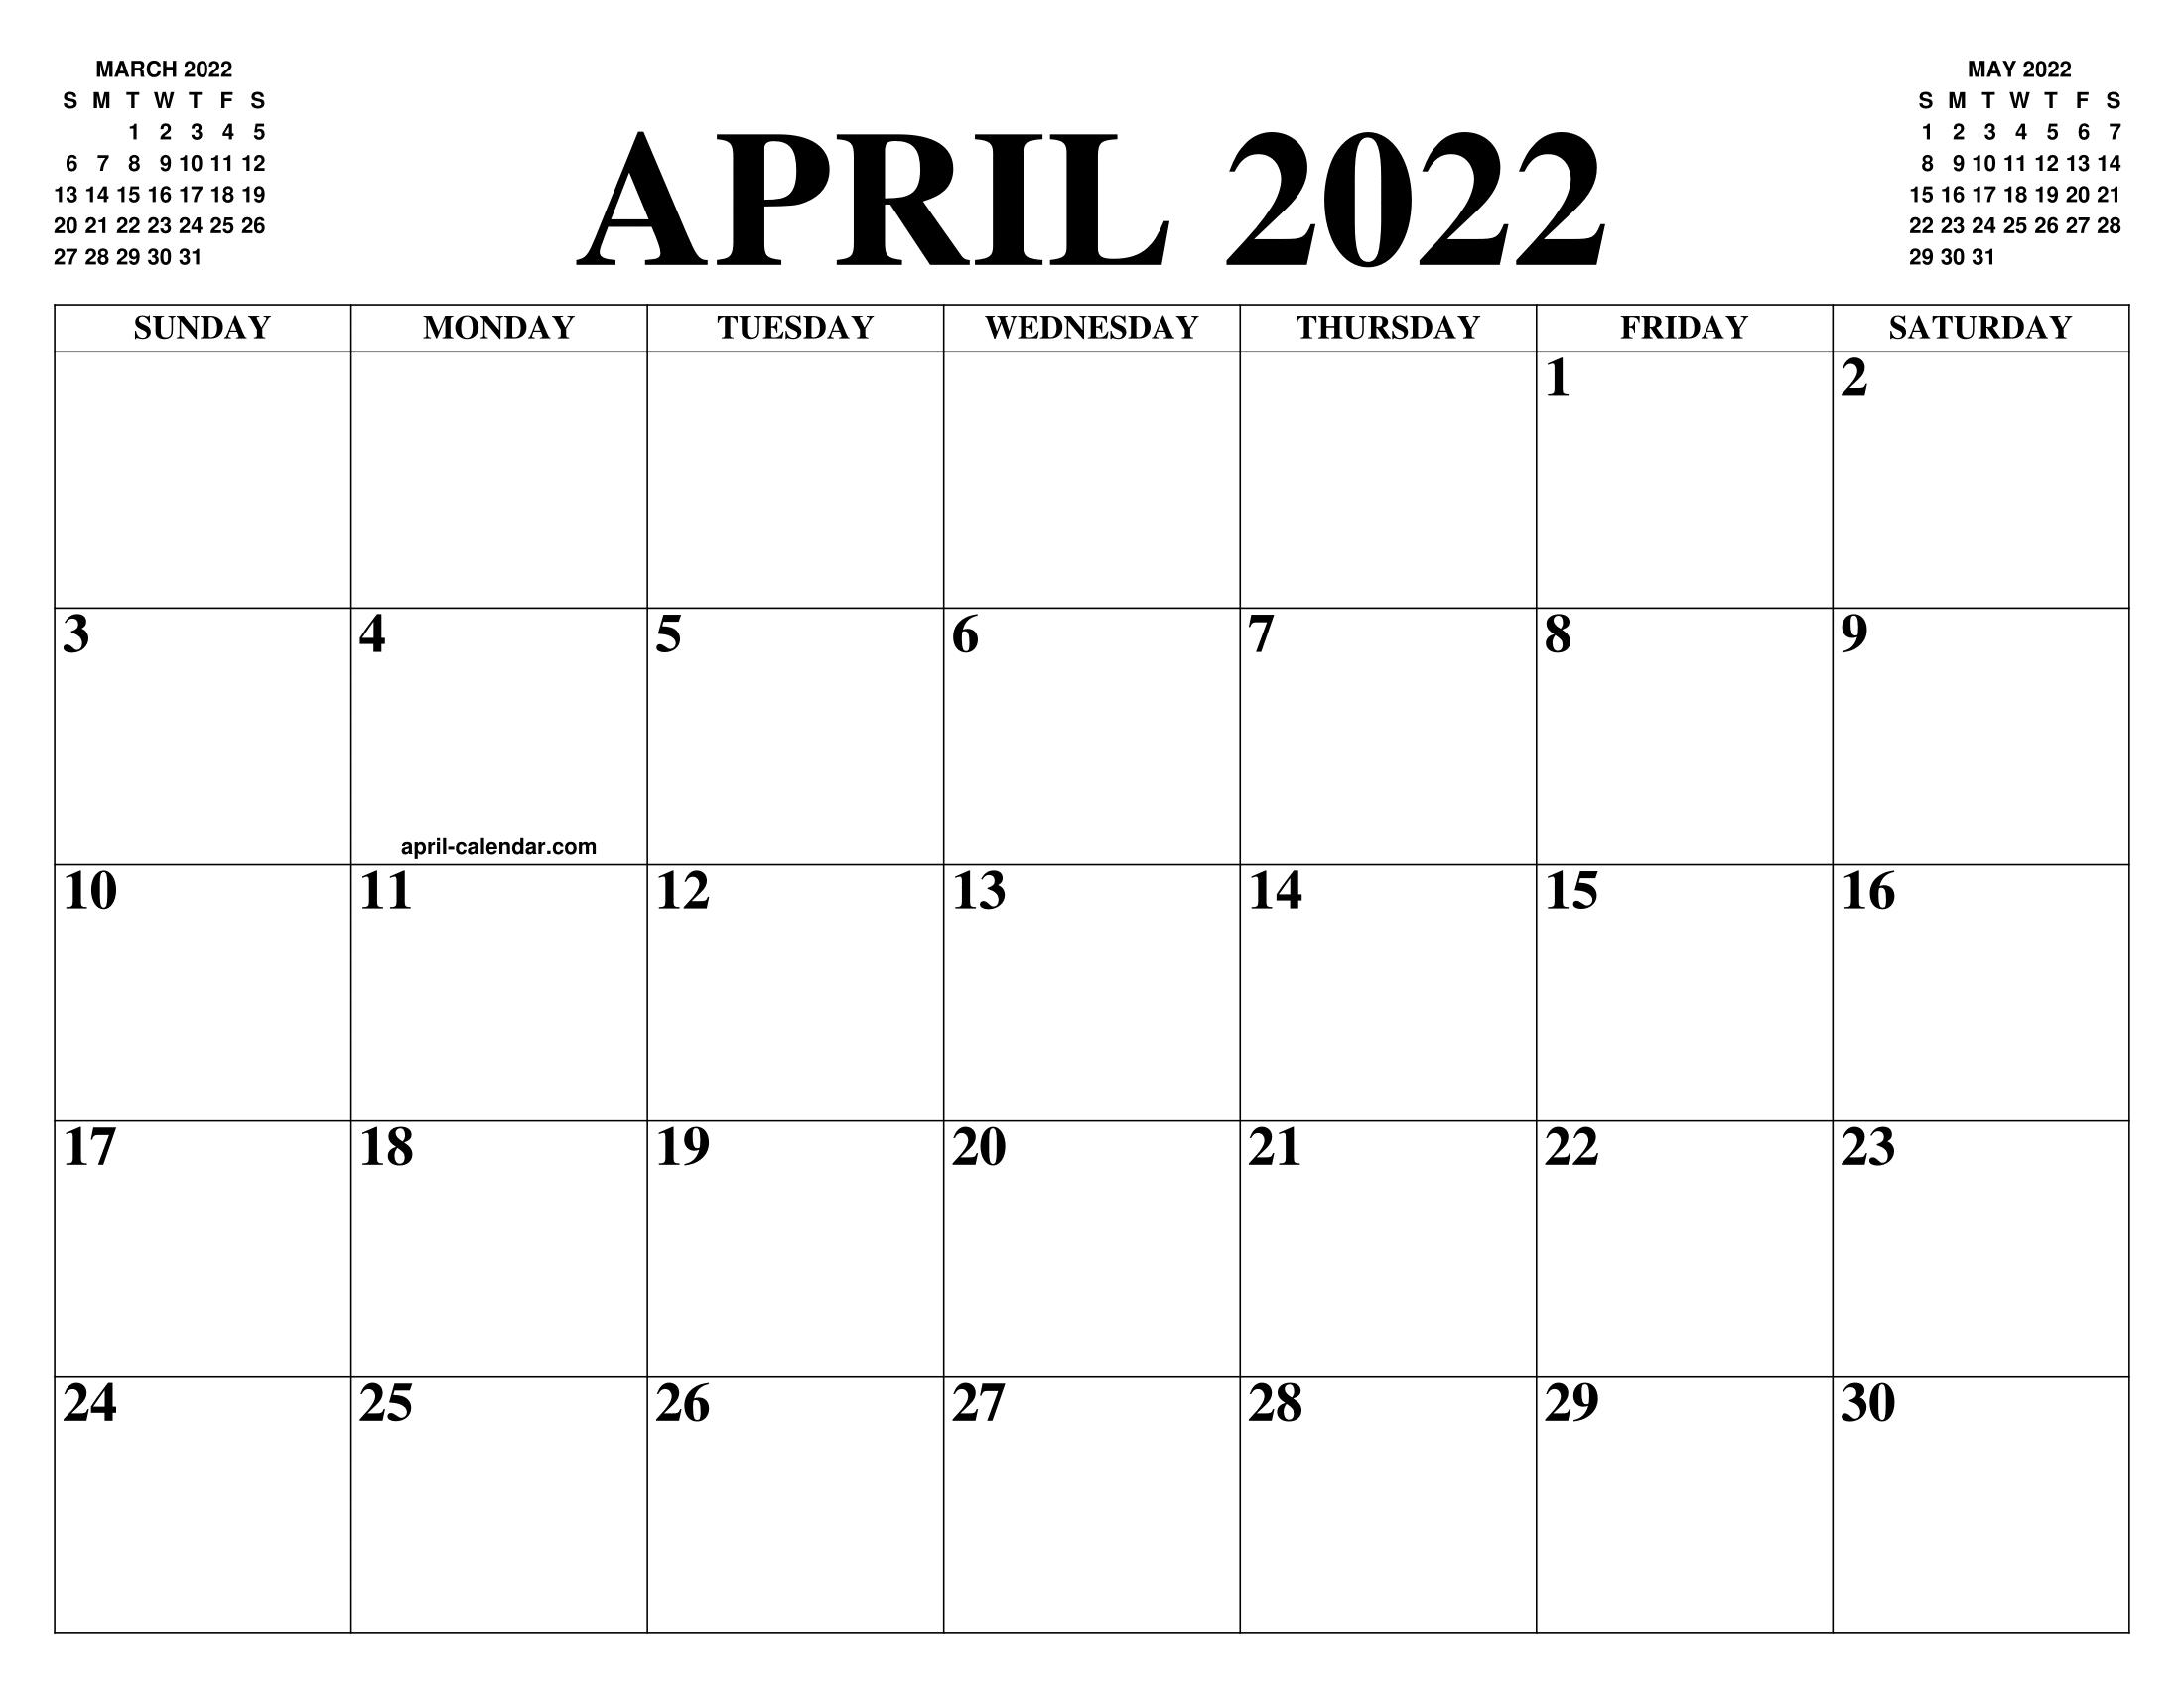 April 2022 Calendar Printable.April 2022 Calendar Of The Month Free Printable April Calendar Of The Year Agenda